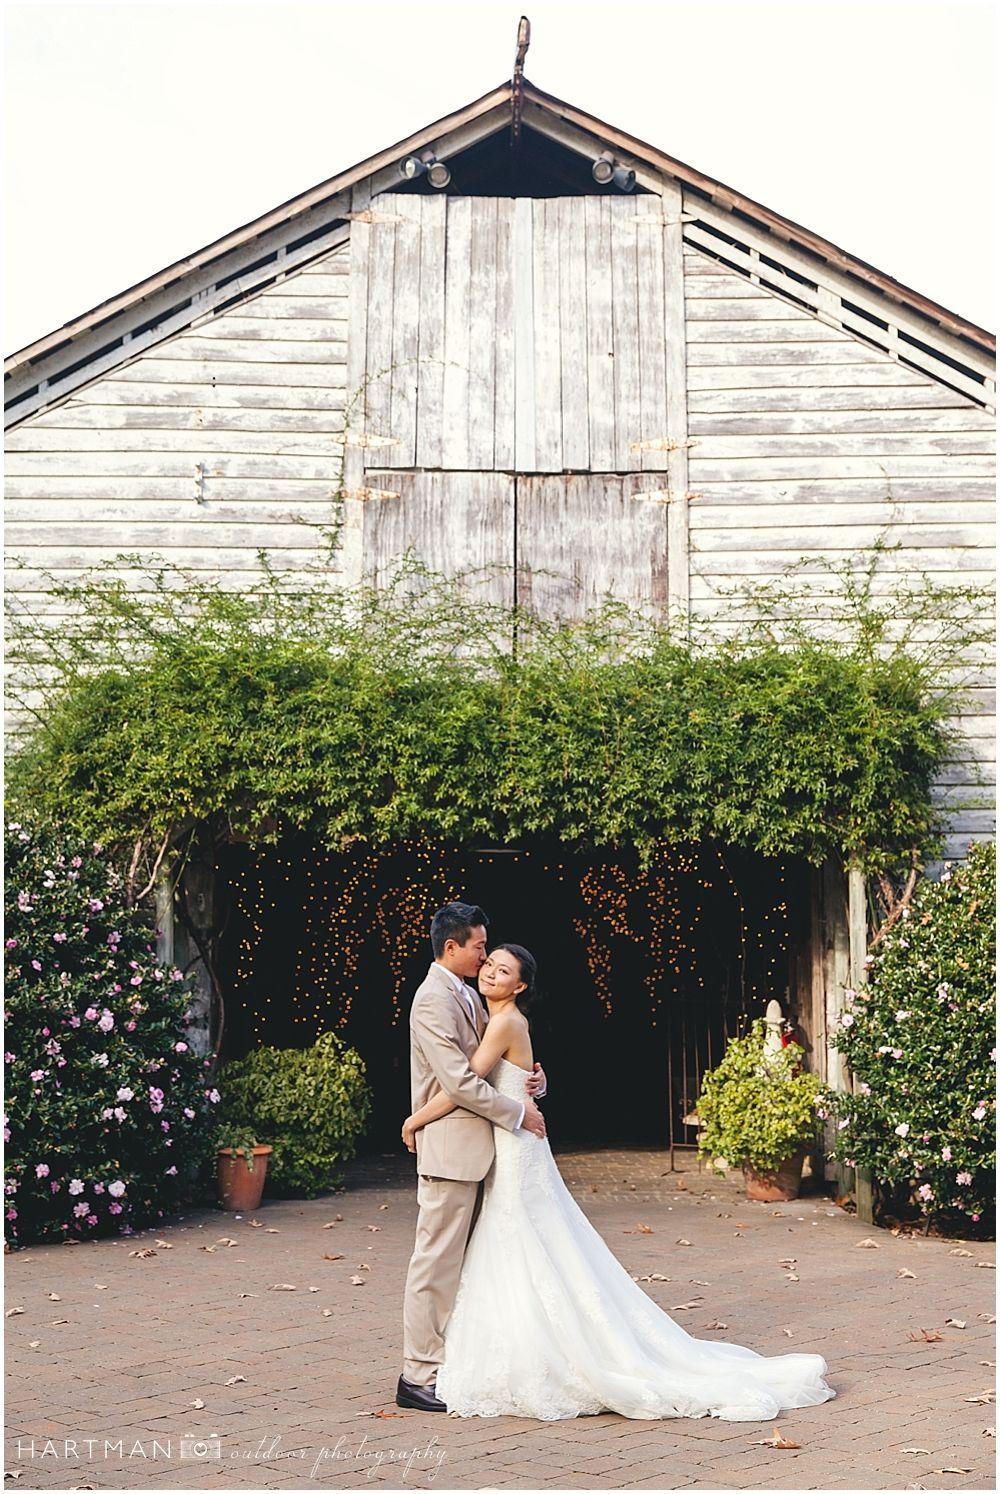 Fearrington Barn Wedding Village Pittsboro Nc Fall Bride And Groom Portraits Raleigh Asheville North Carolina